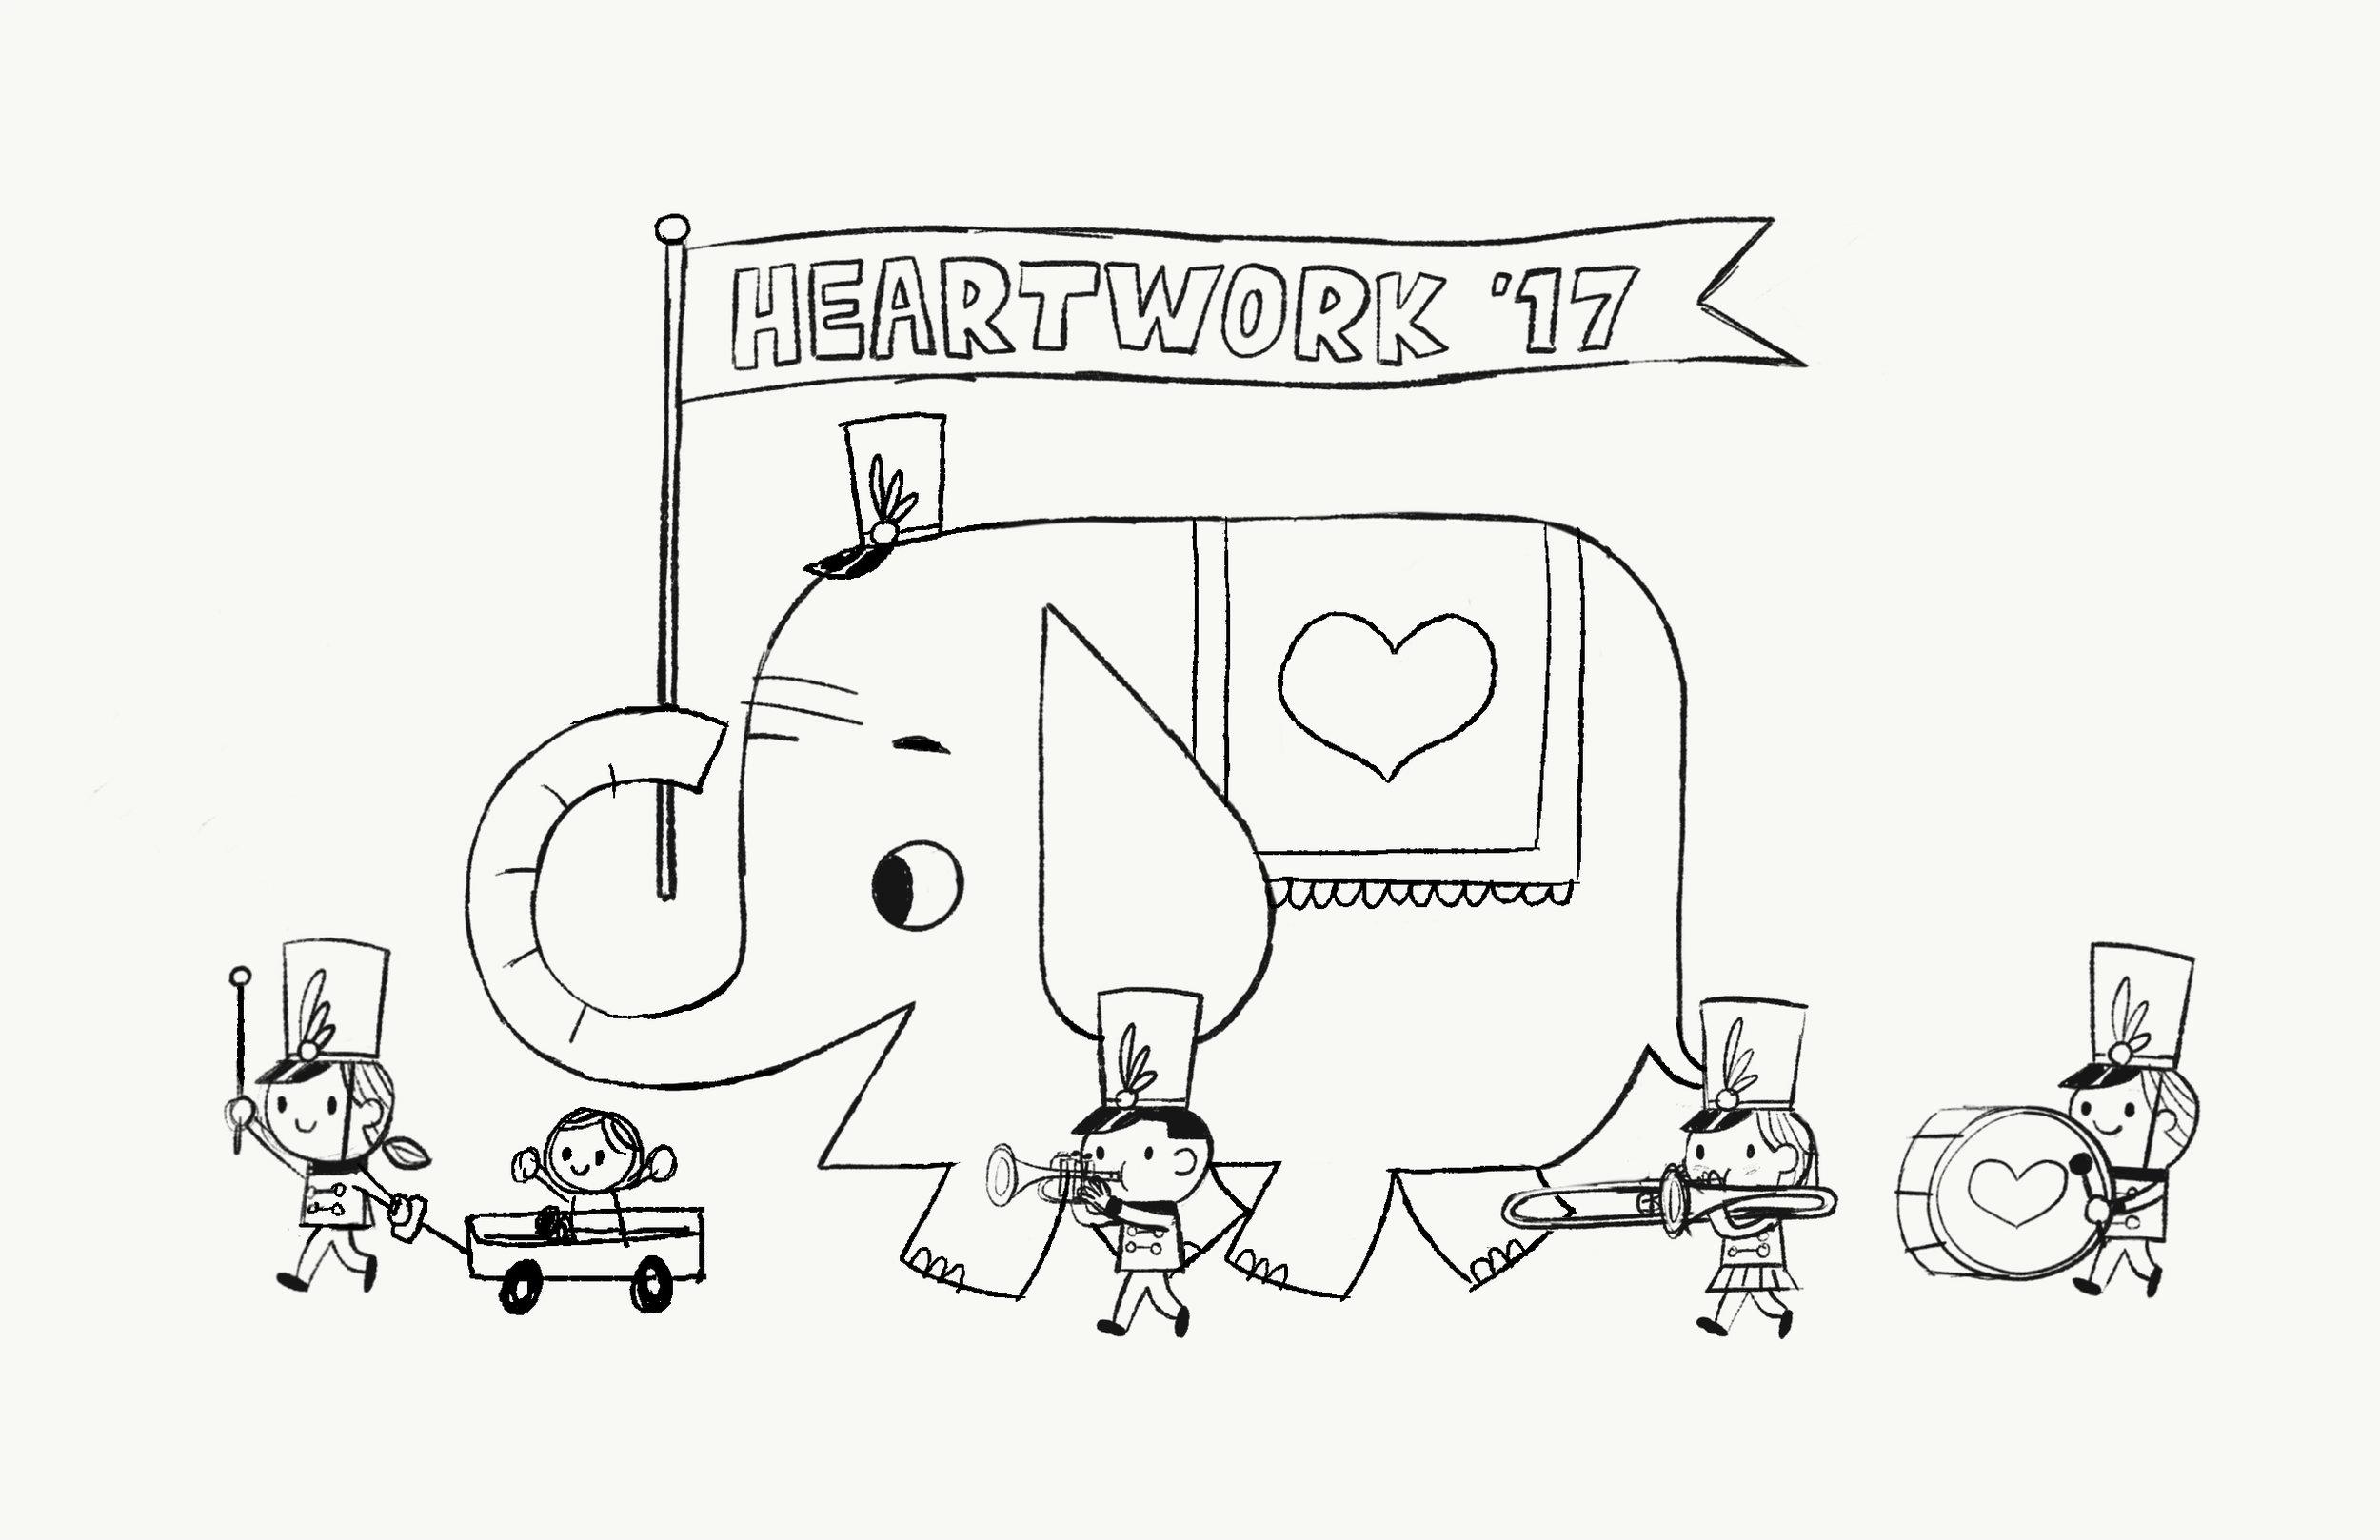 Project---Sketch-1_22.jpg